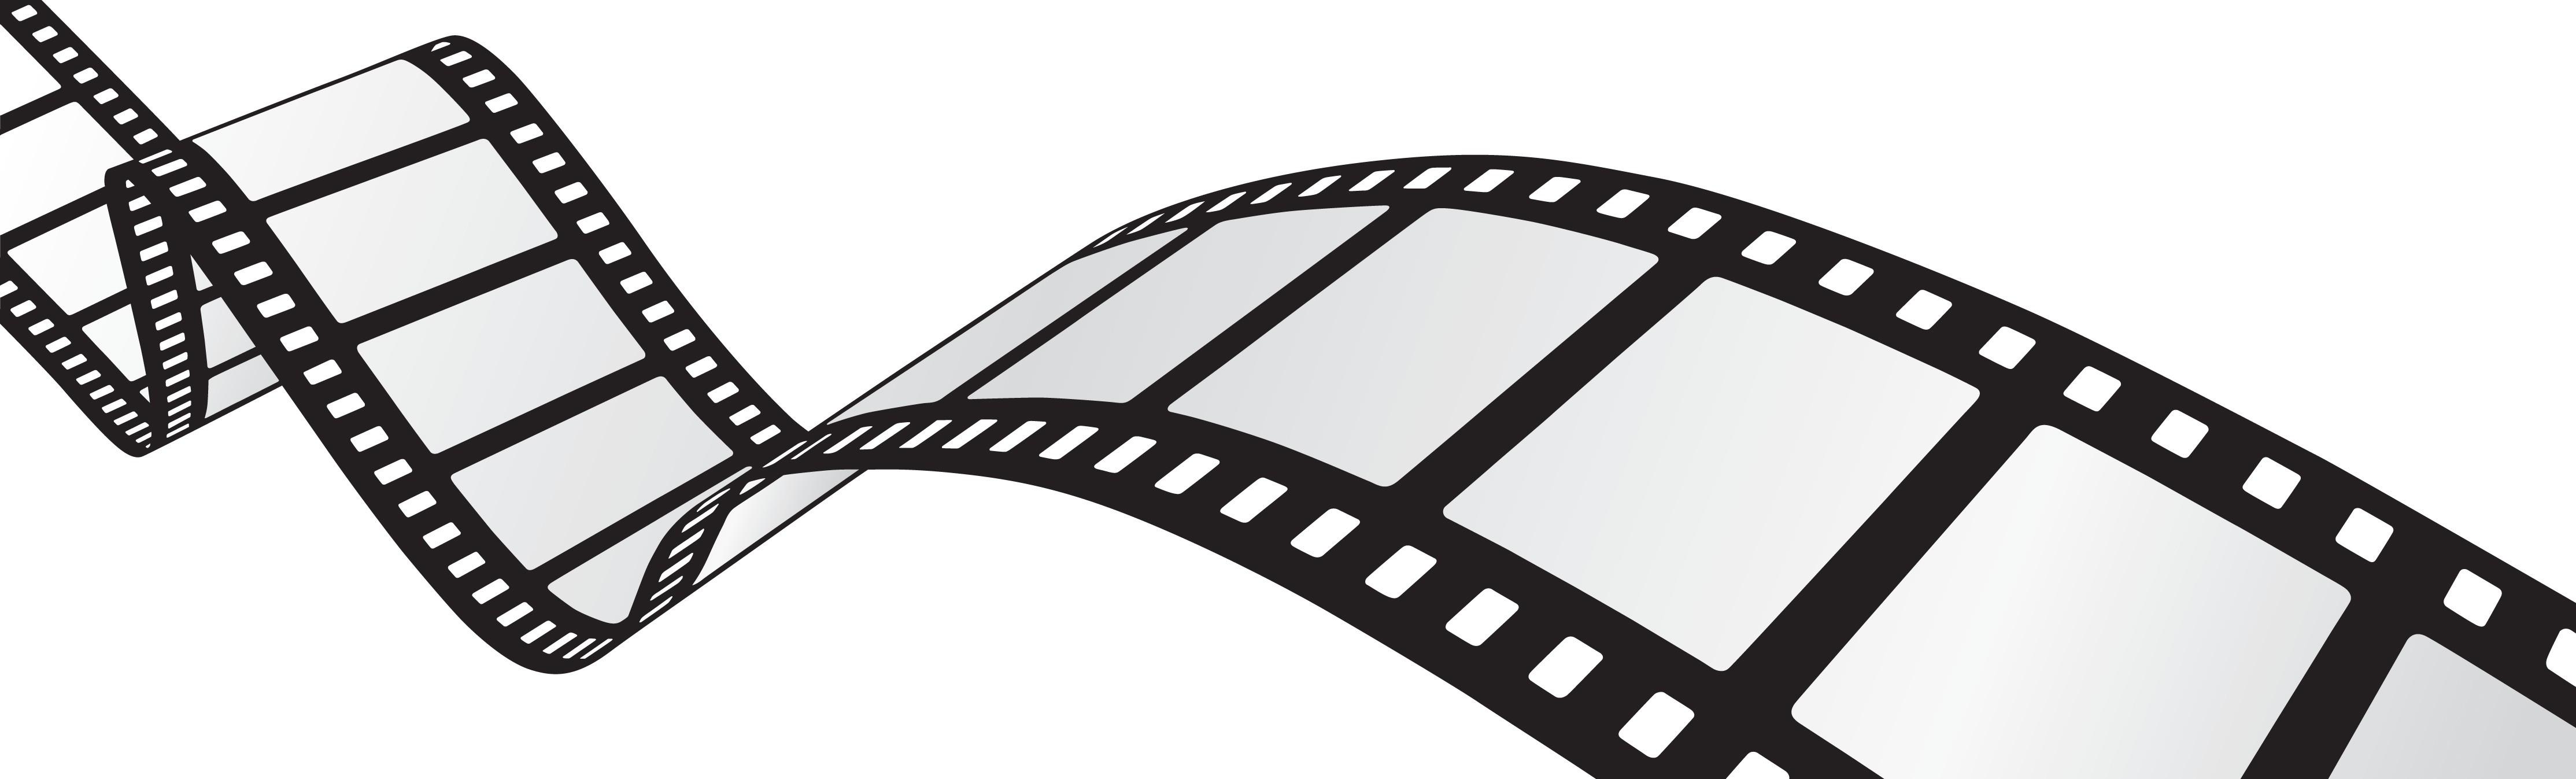 Film Reel PNG - 64807